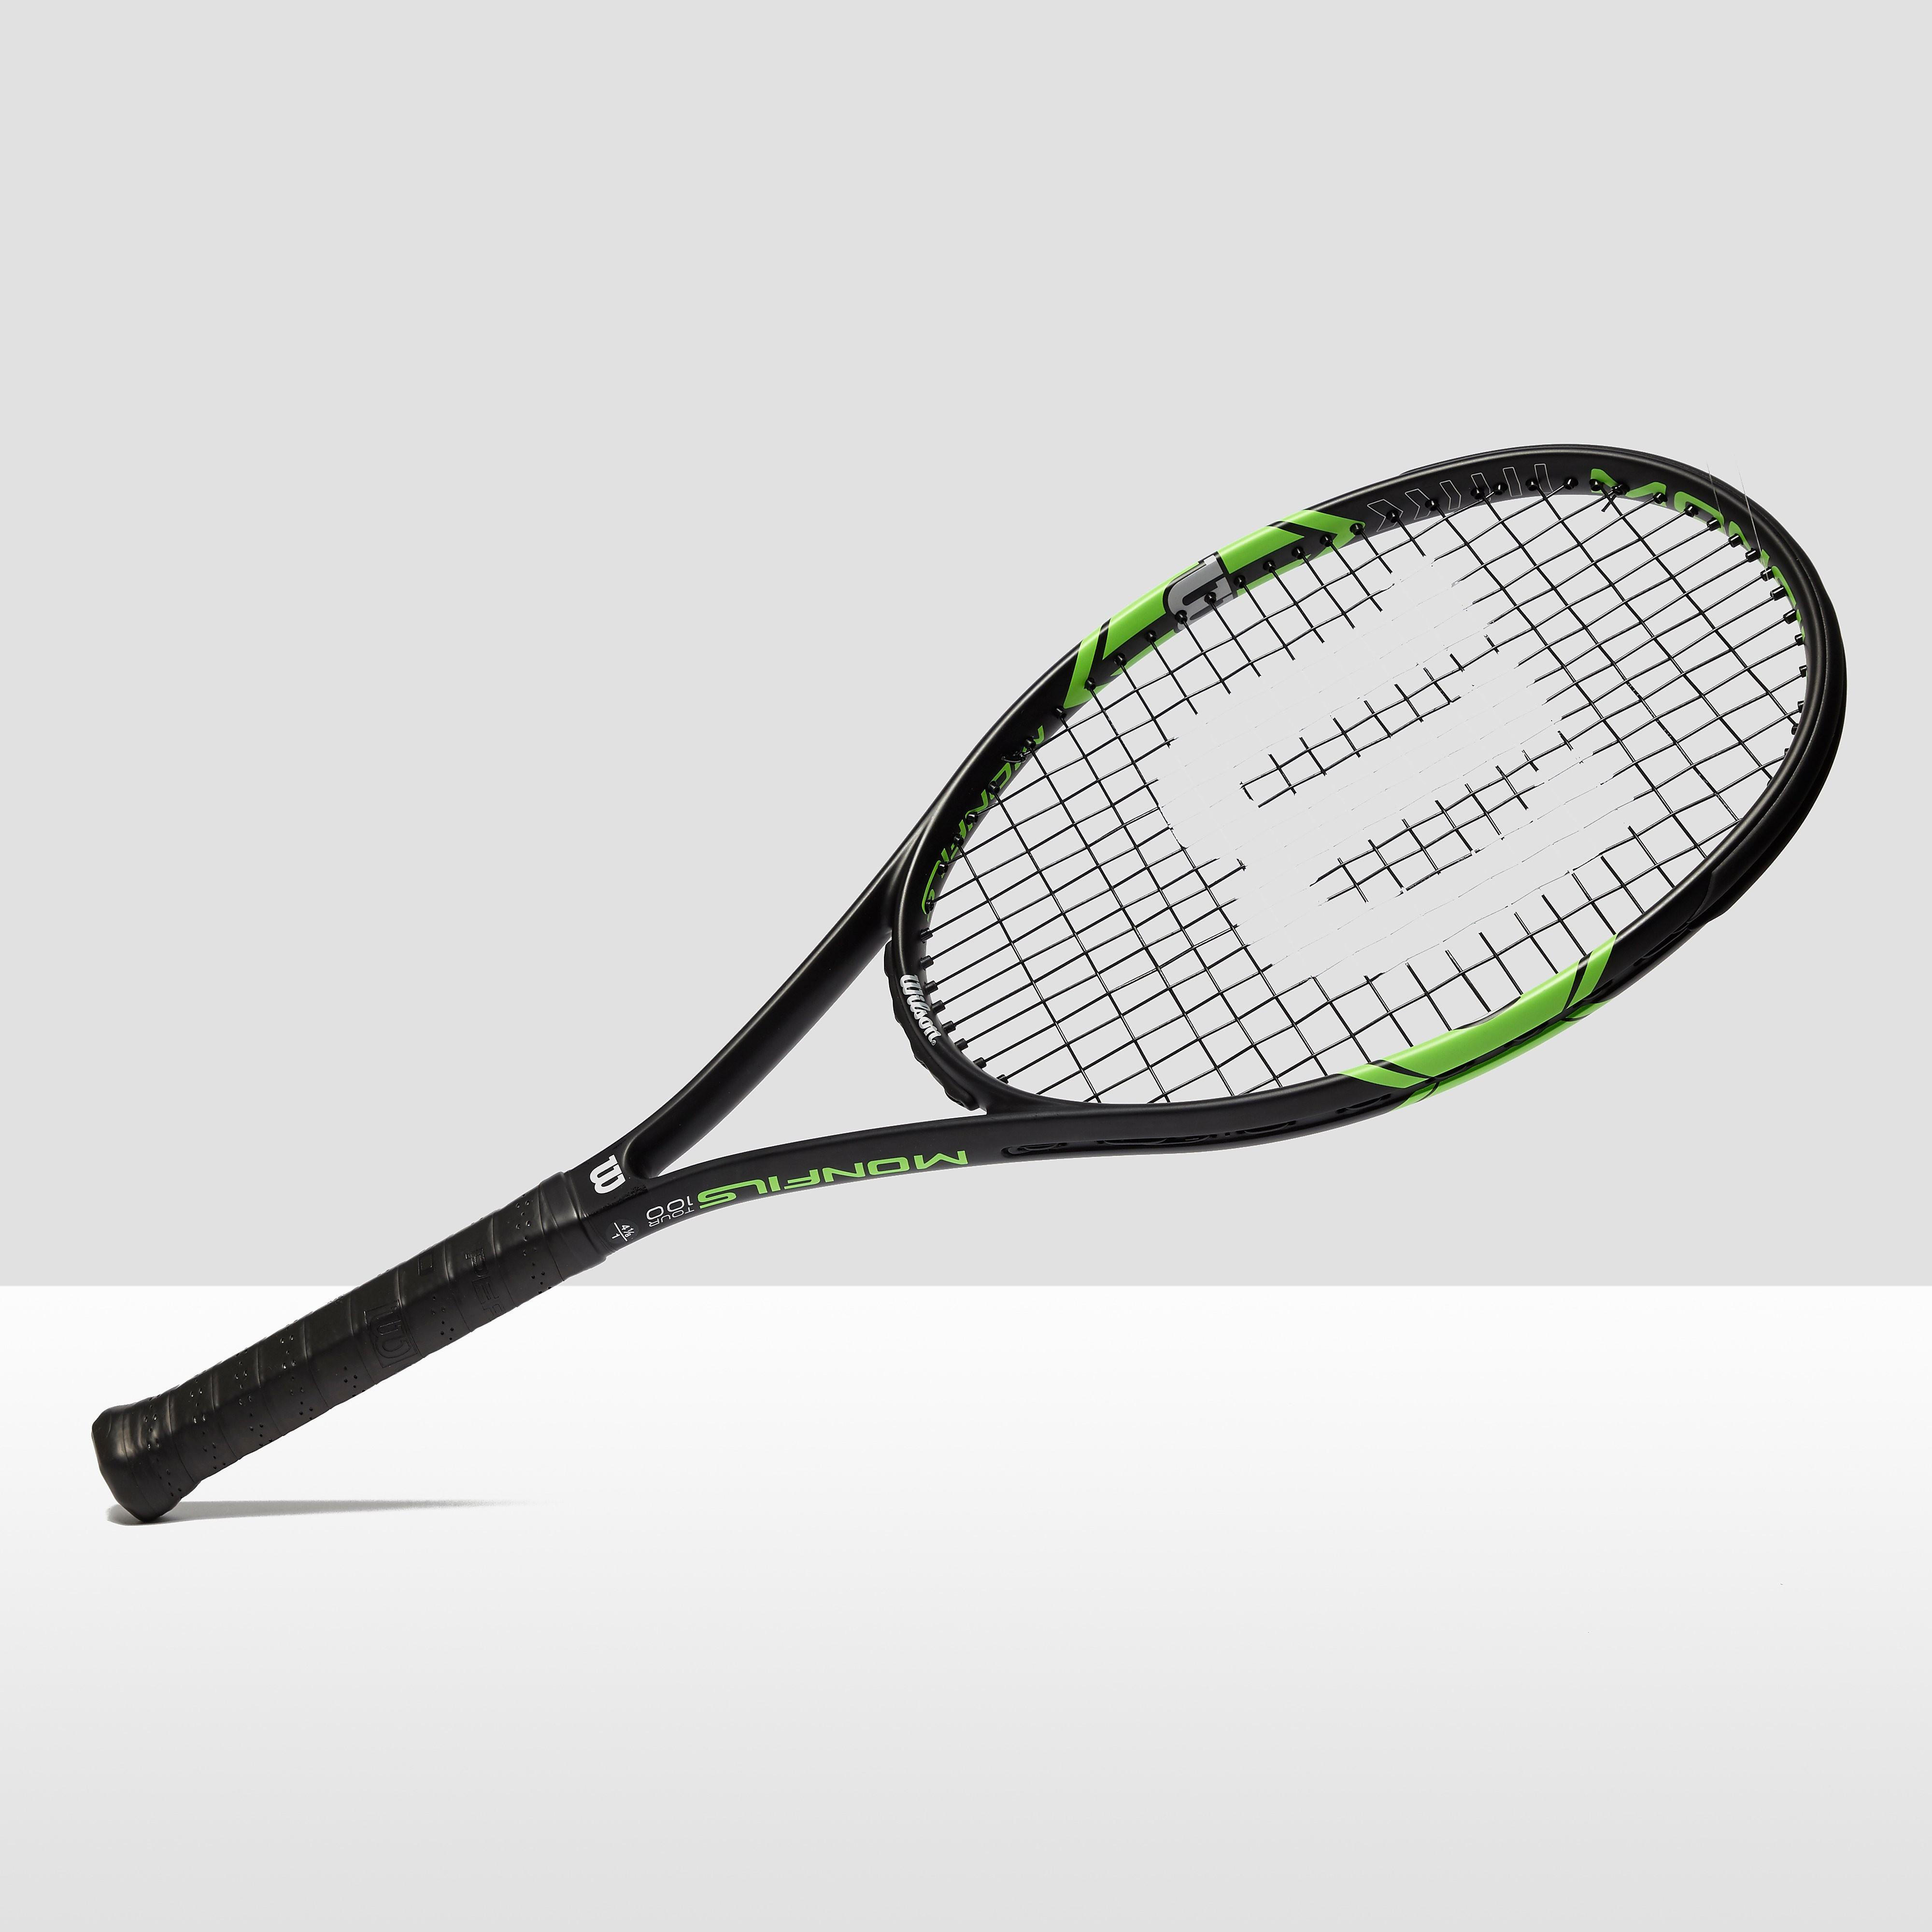 Wilson Monfils Tour 100 Tennis Racket